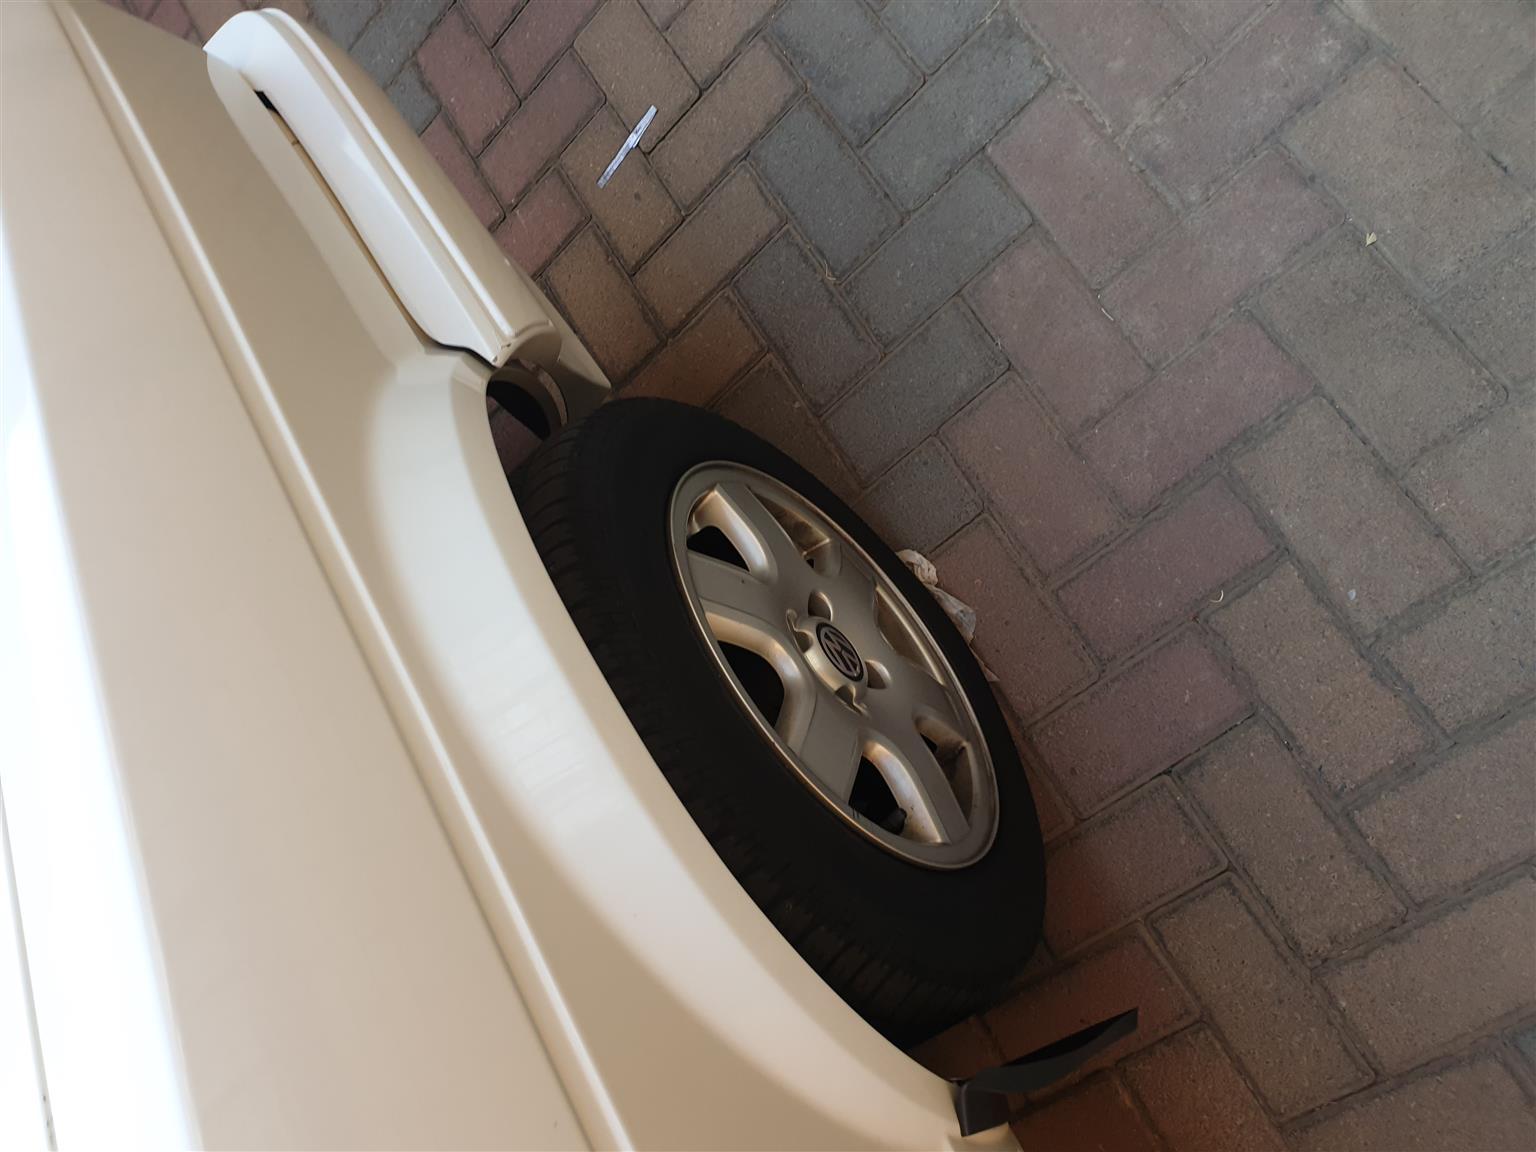 2008 VW Citi Storm 1.4i